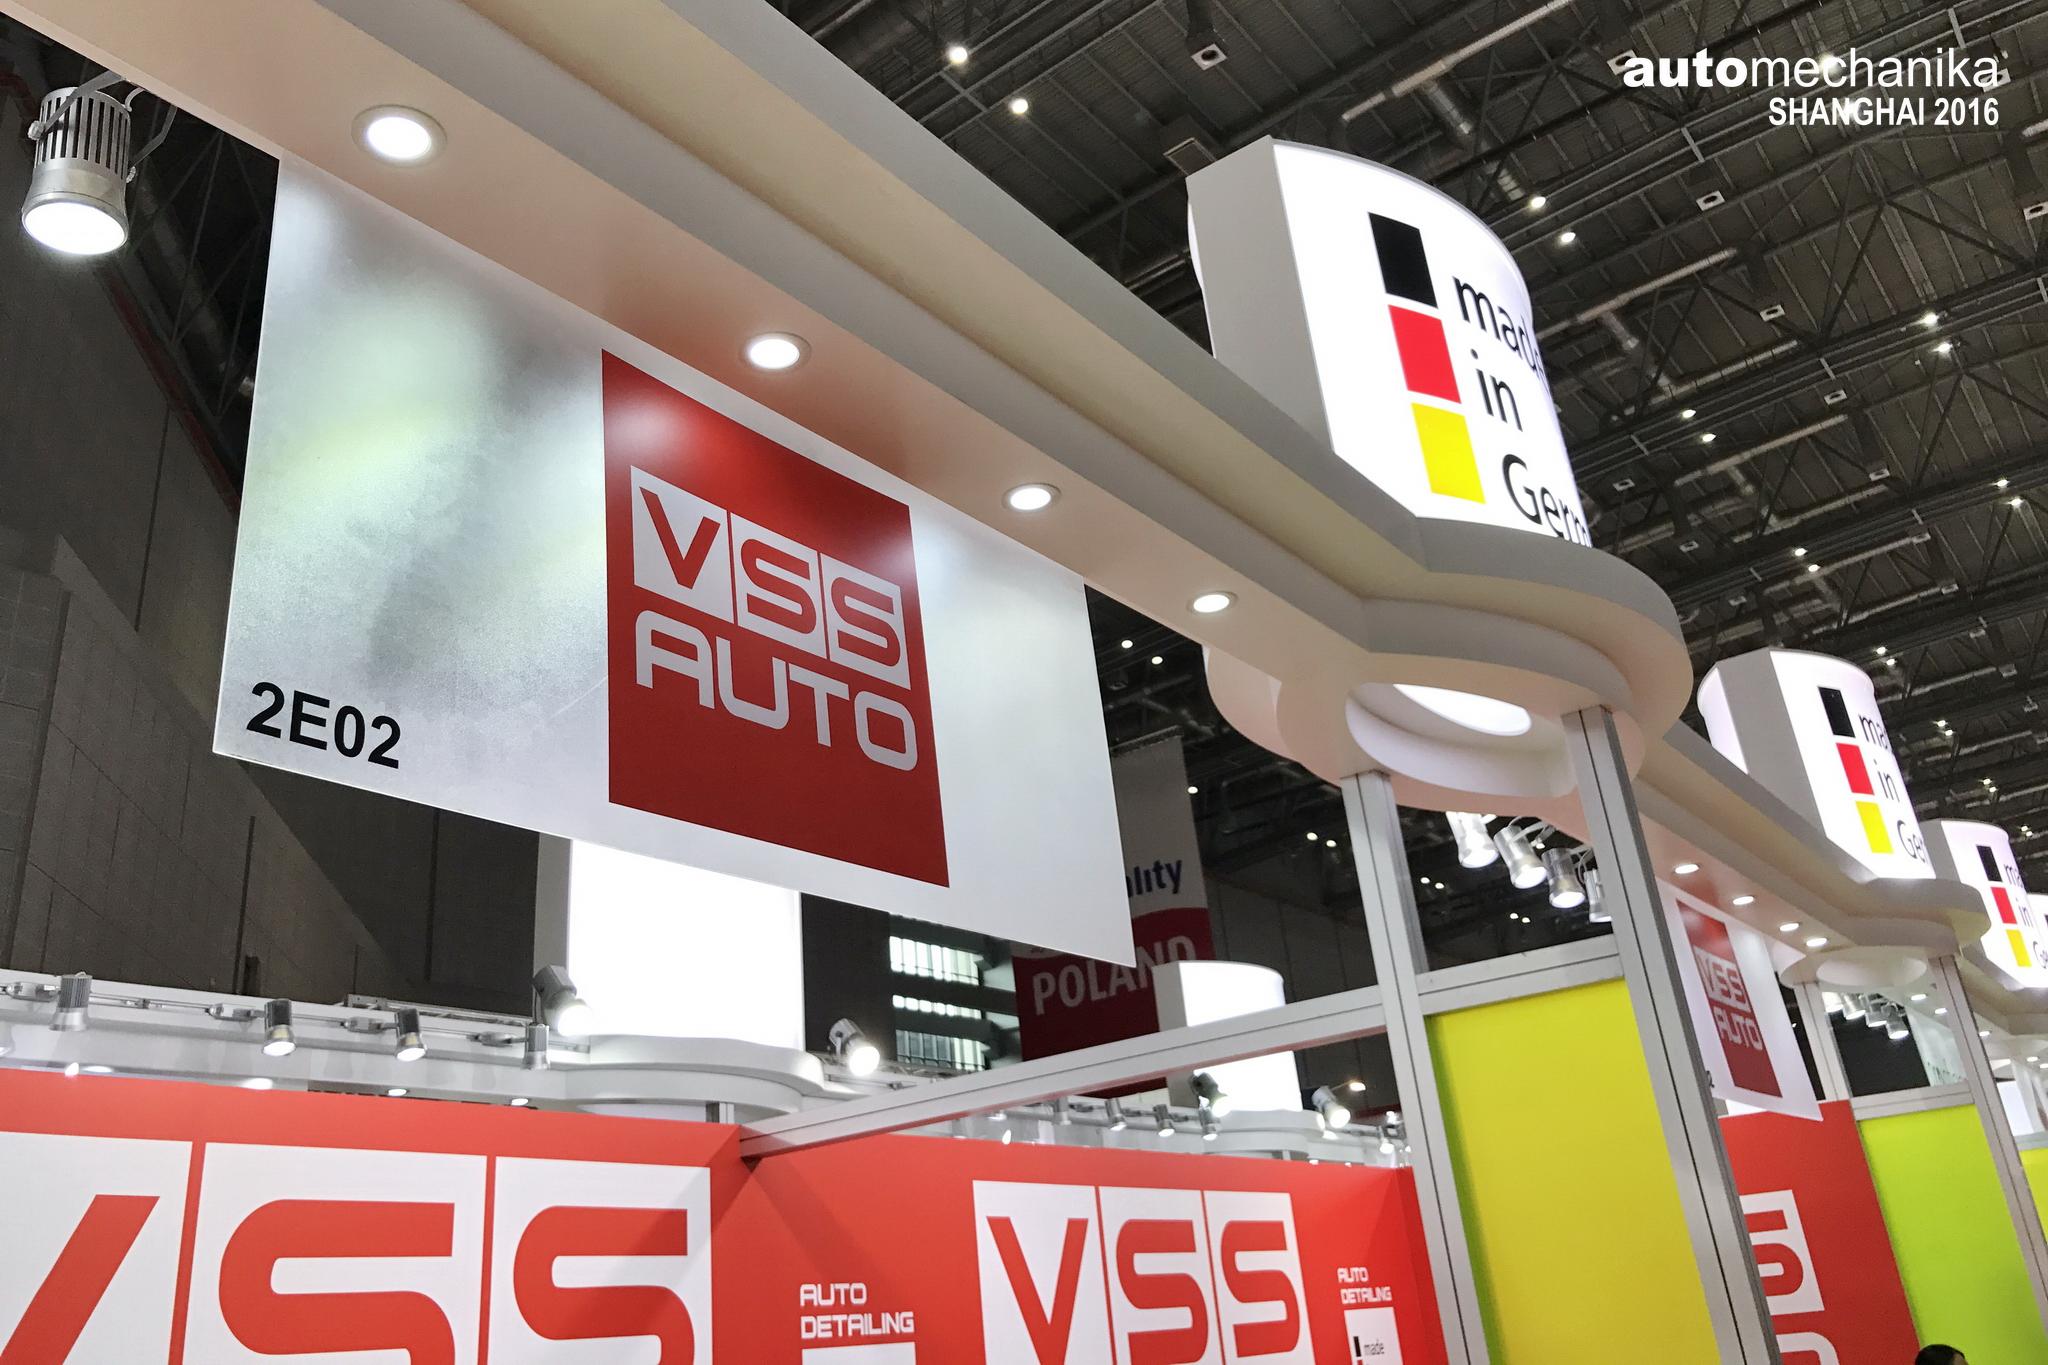 vss-auto-automechanika-shanghai-1a